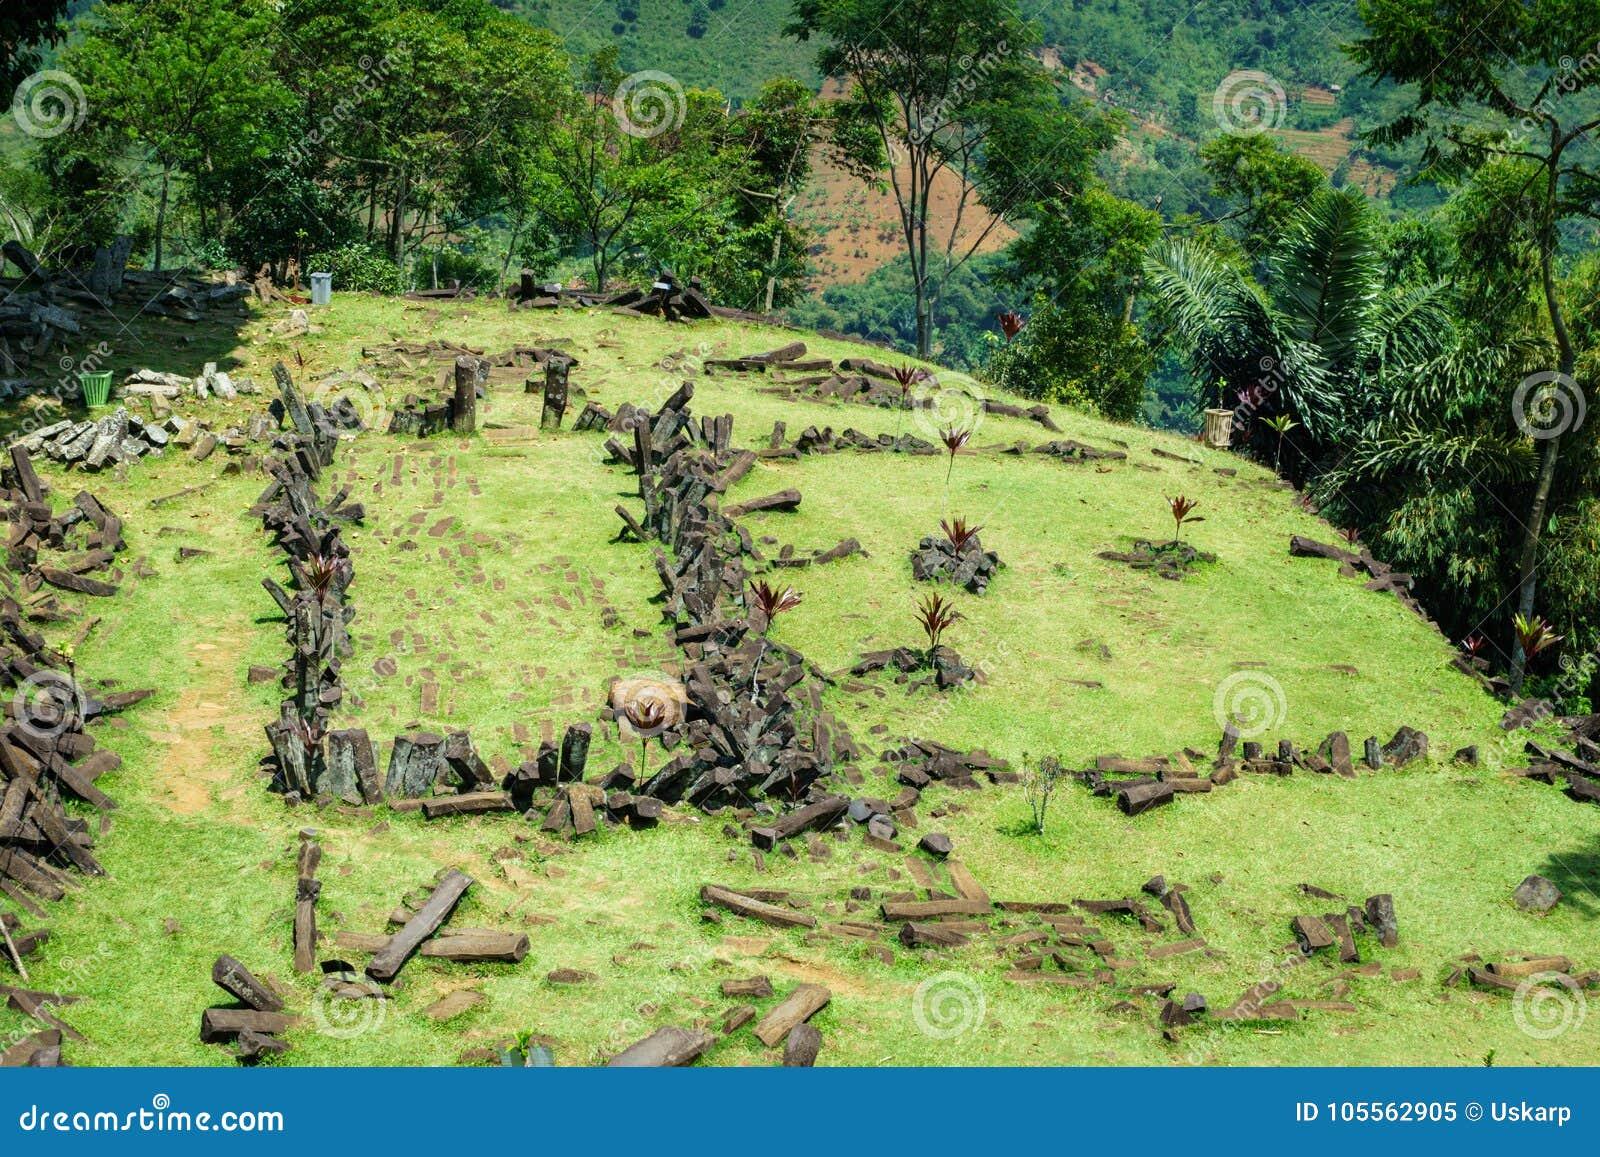 Gunung Padang巨石站点在展玉,西爪哇省,印度尼西亚